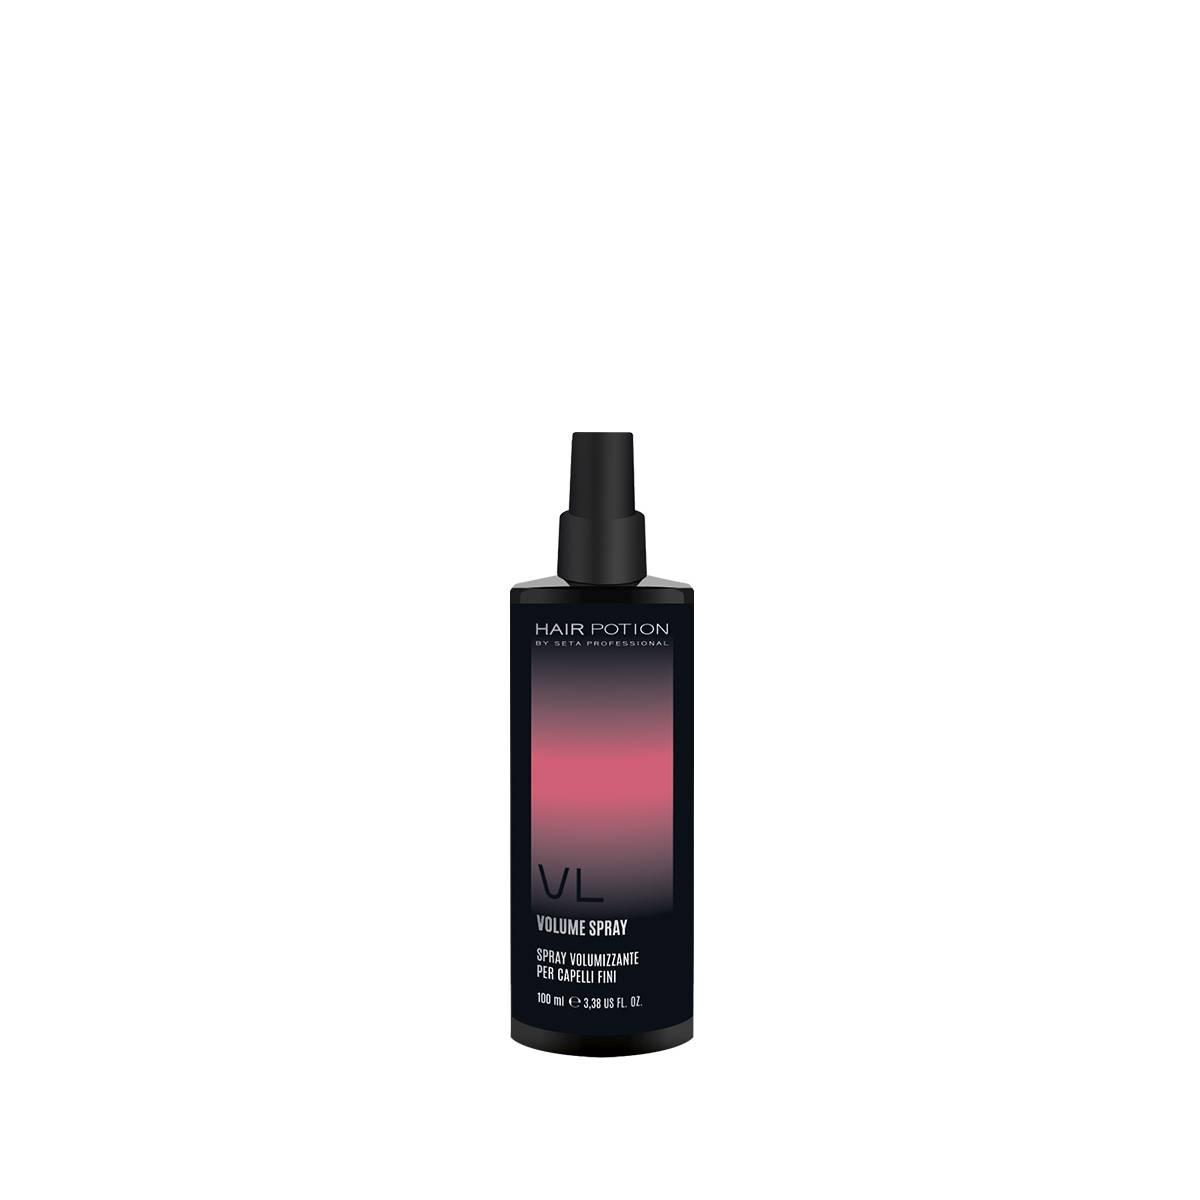 Hair Potion Pro Volume Spray 100ml